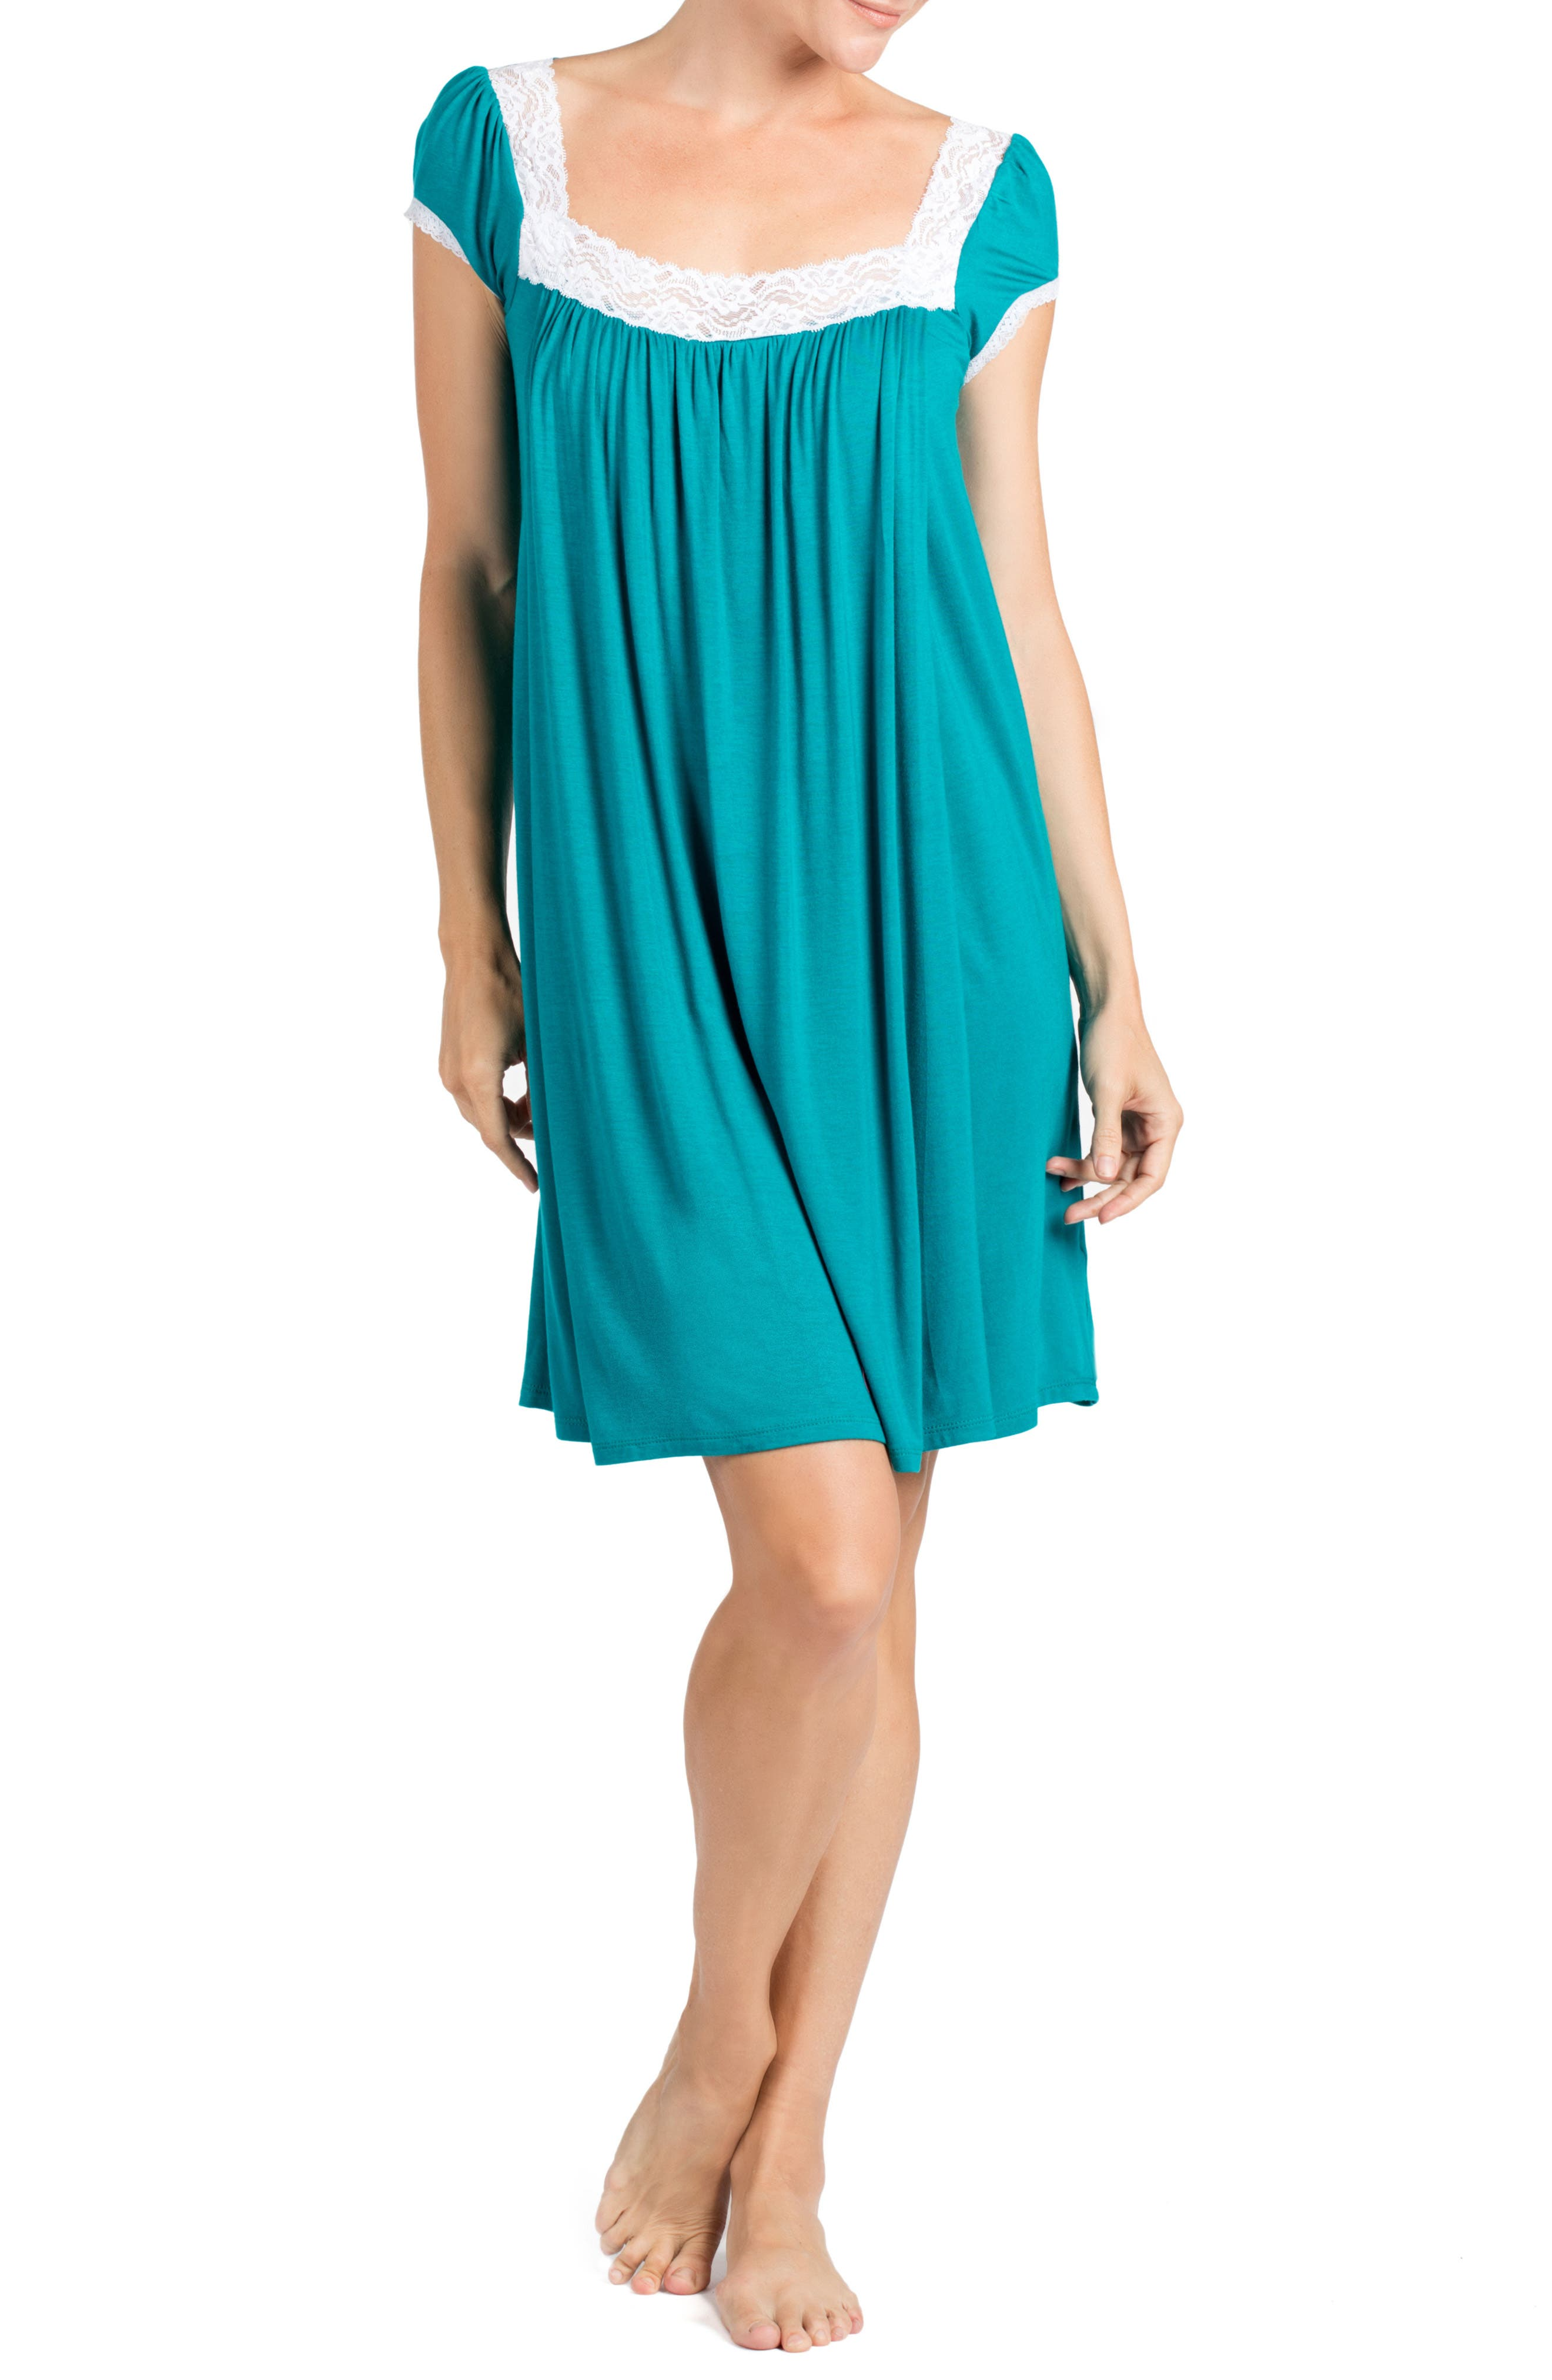 Alternate Image 1 Selected - Savi Mom Joliet Maternity/Nursing Nightgown